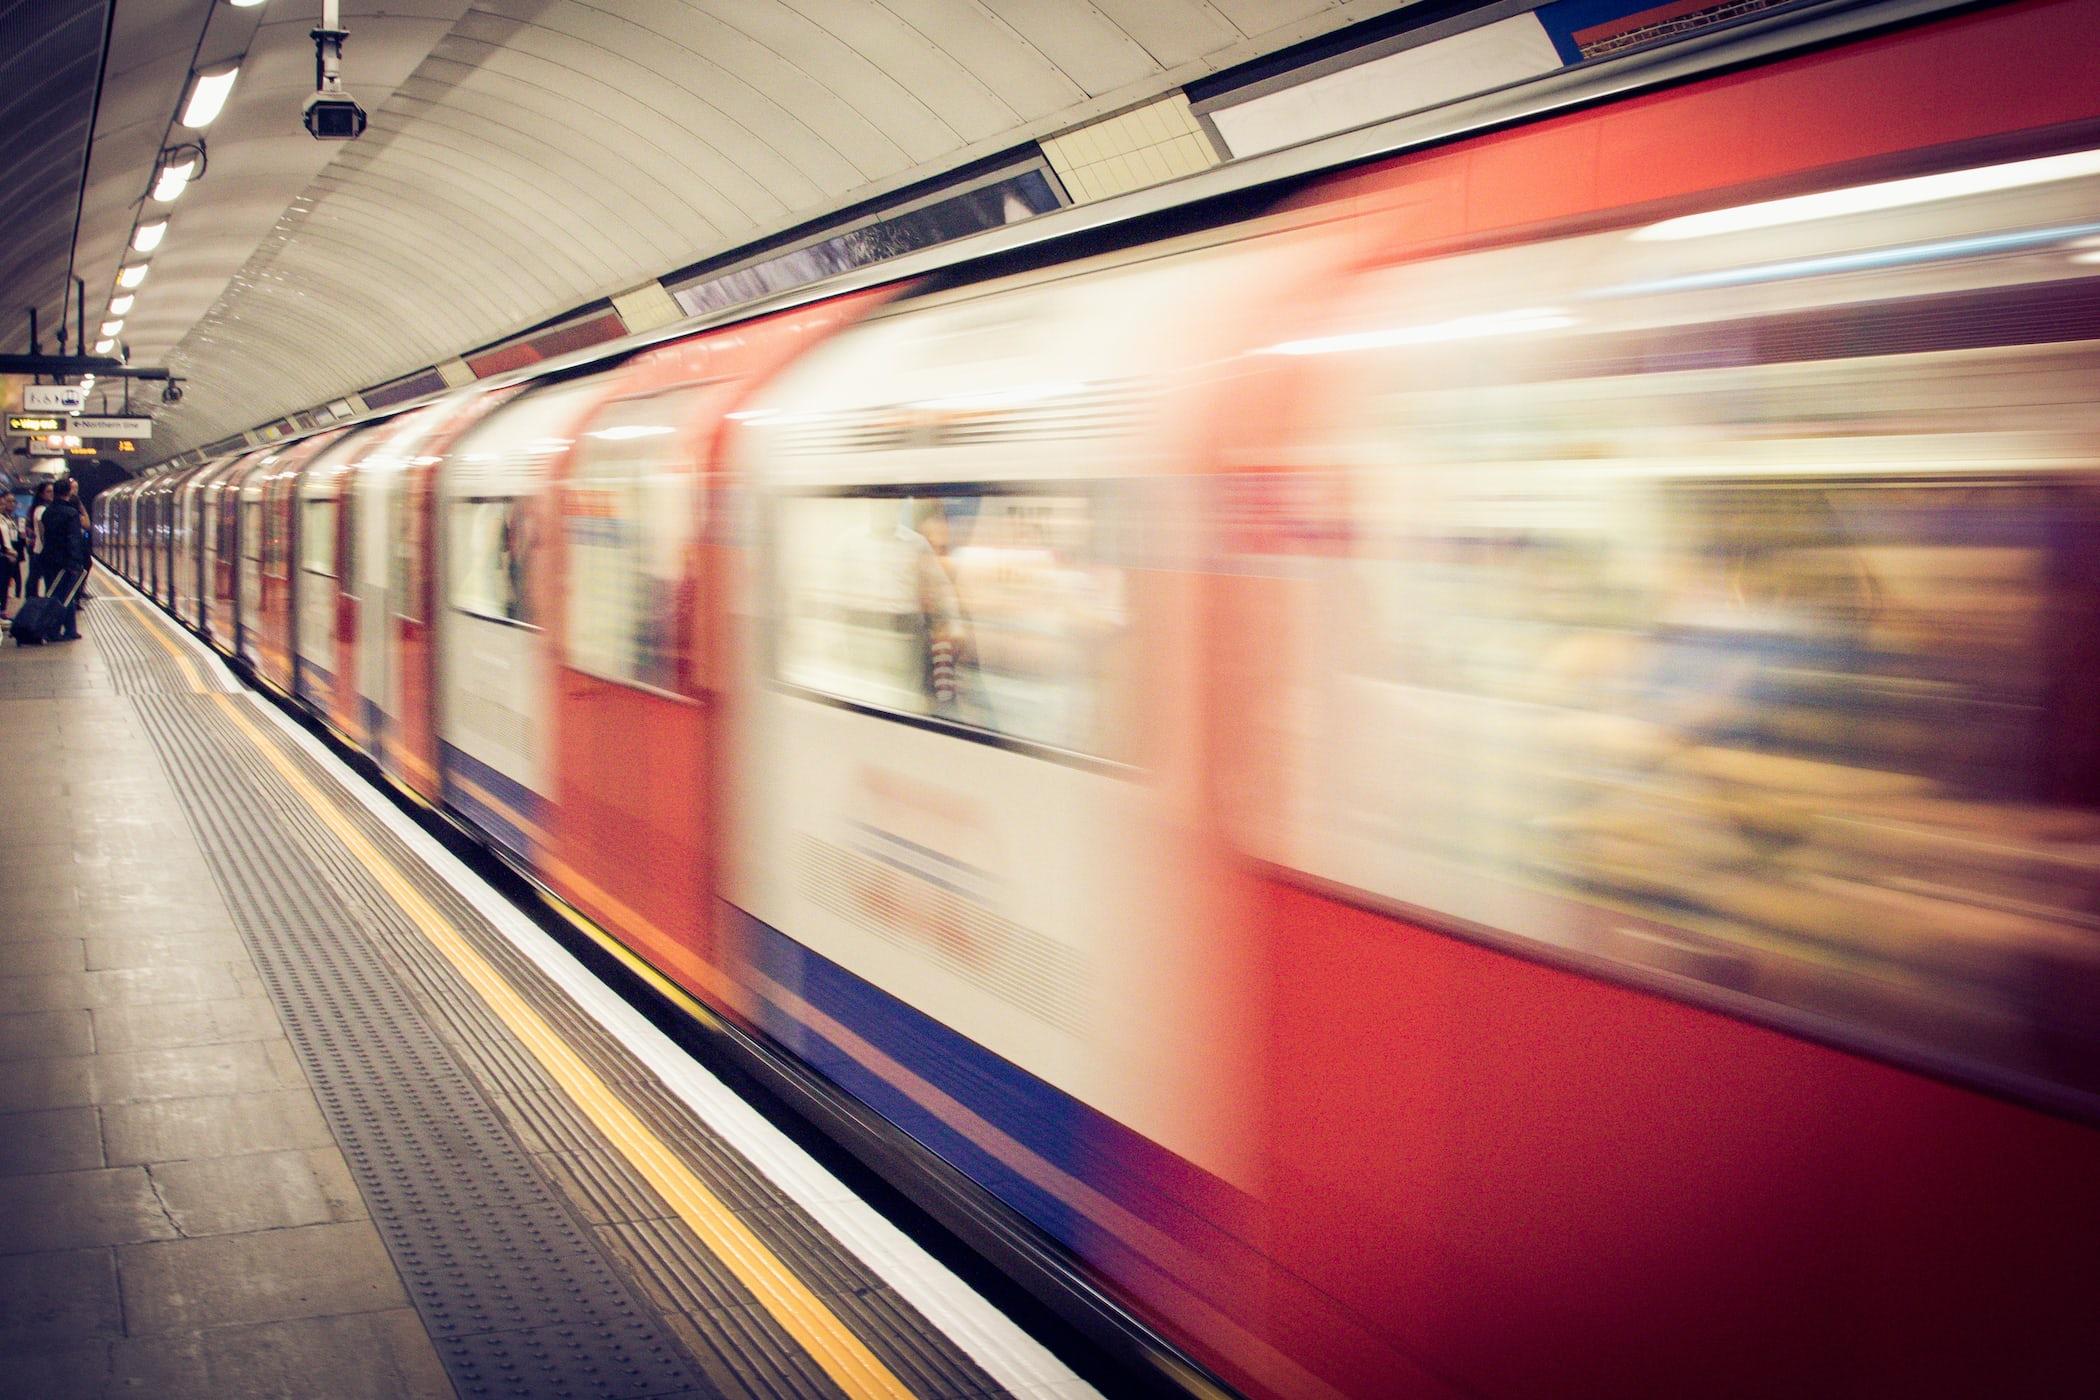 compare the tube train and subway